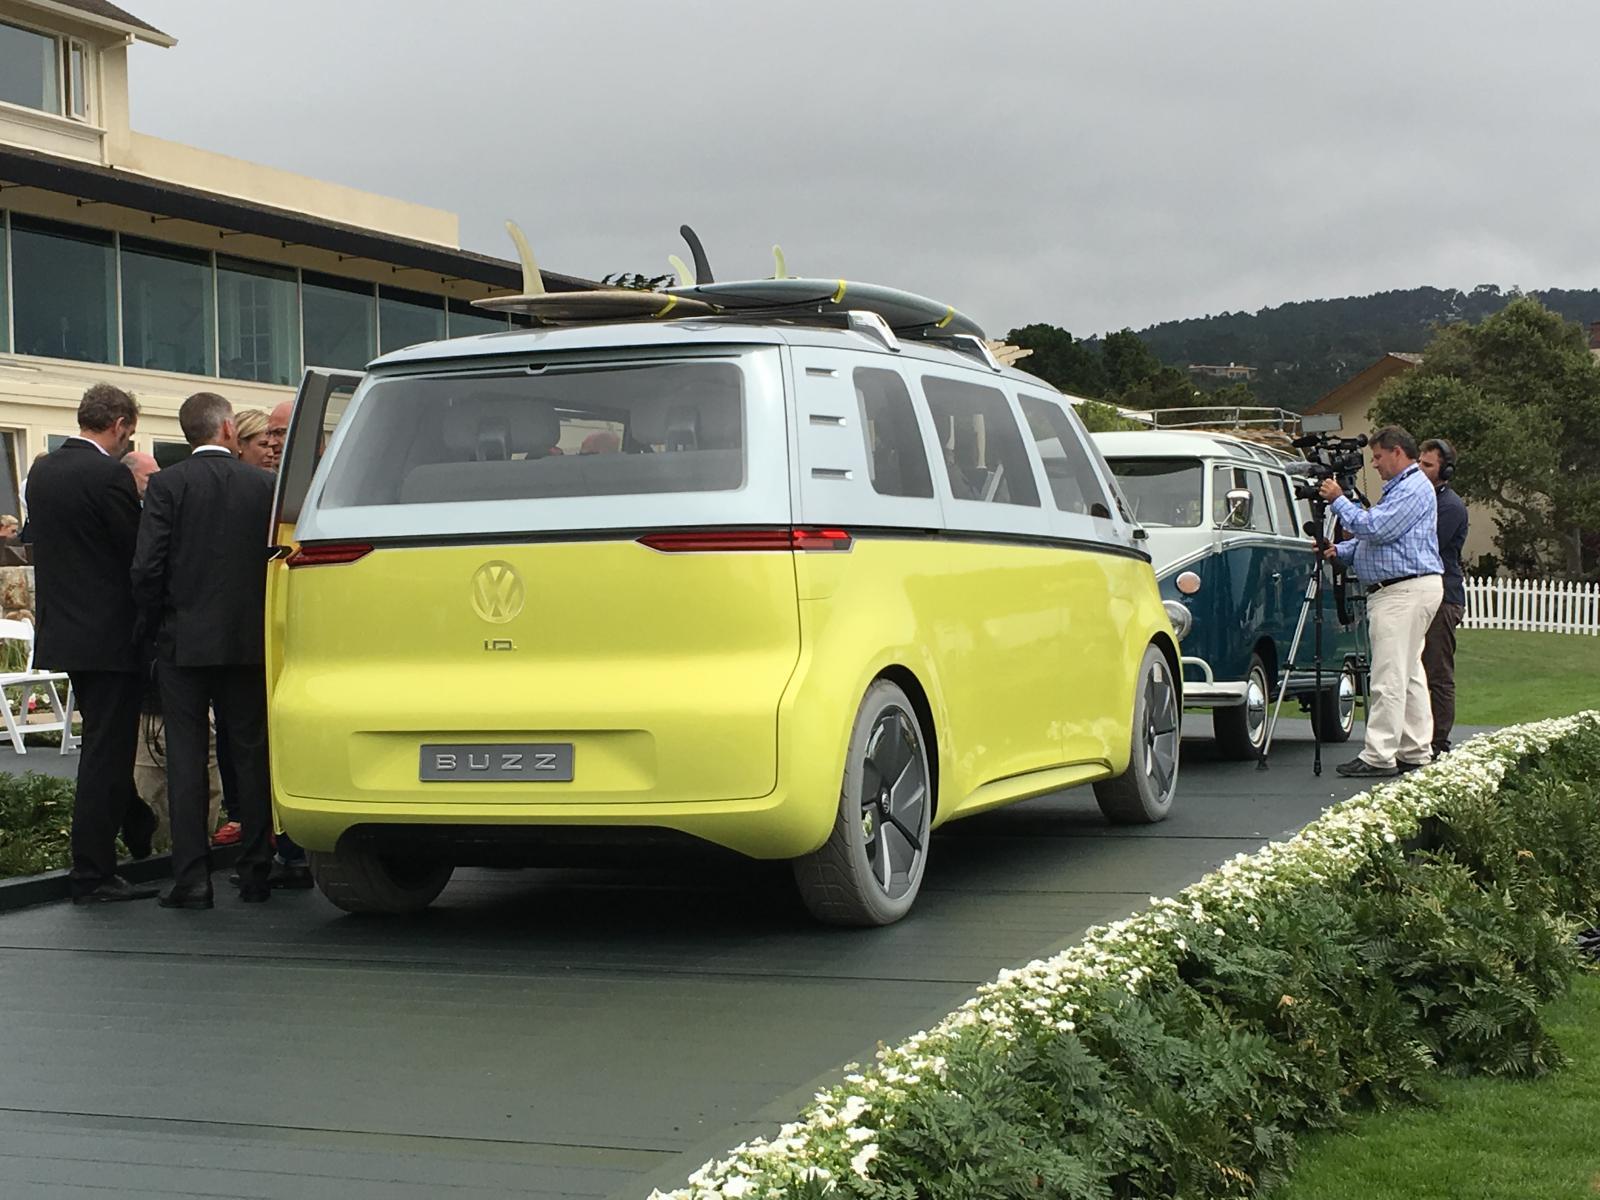 New VW bus